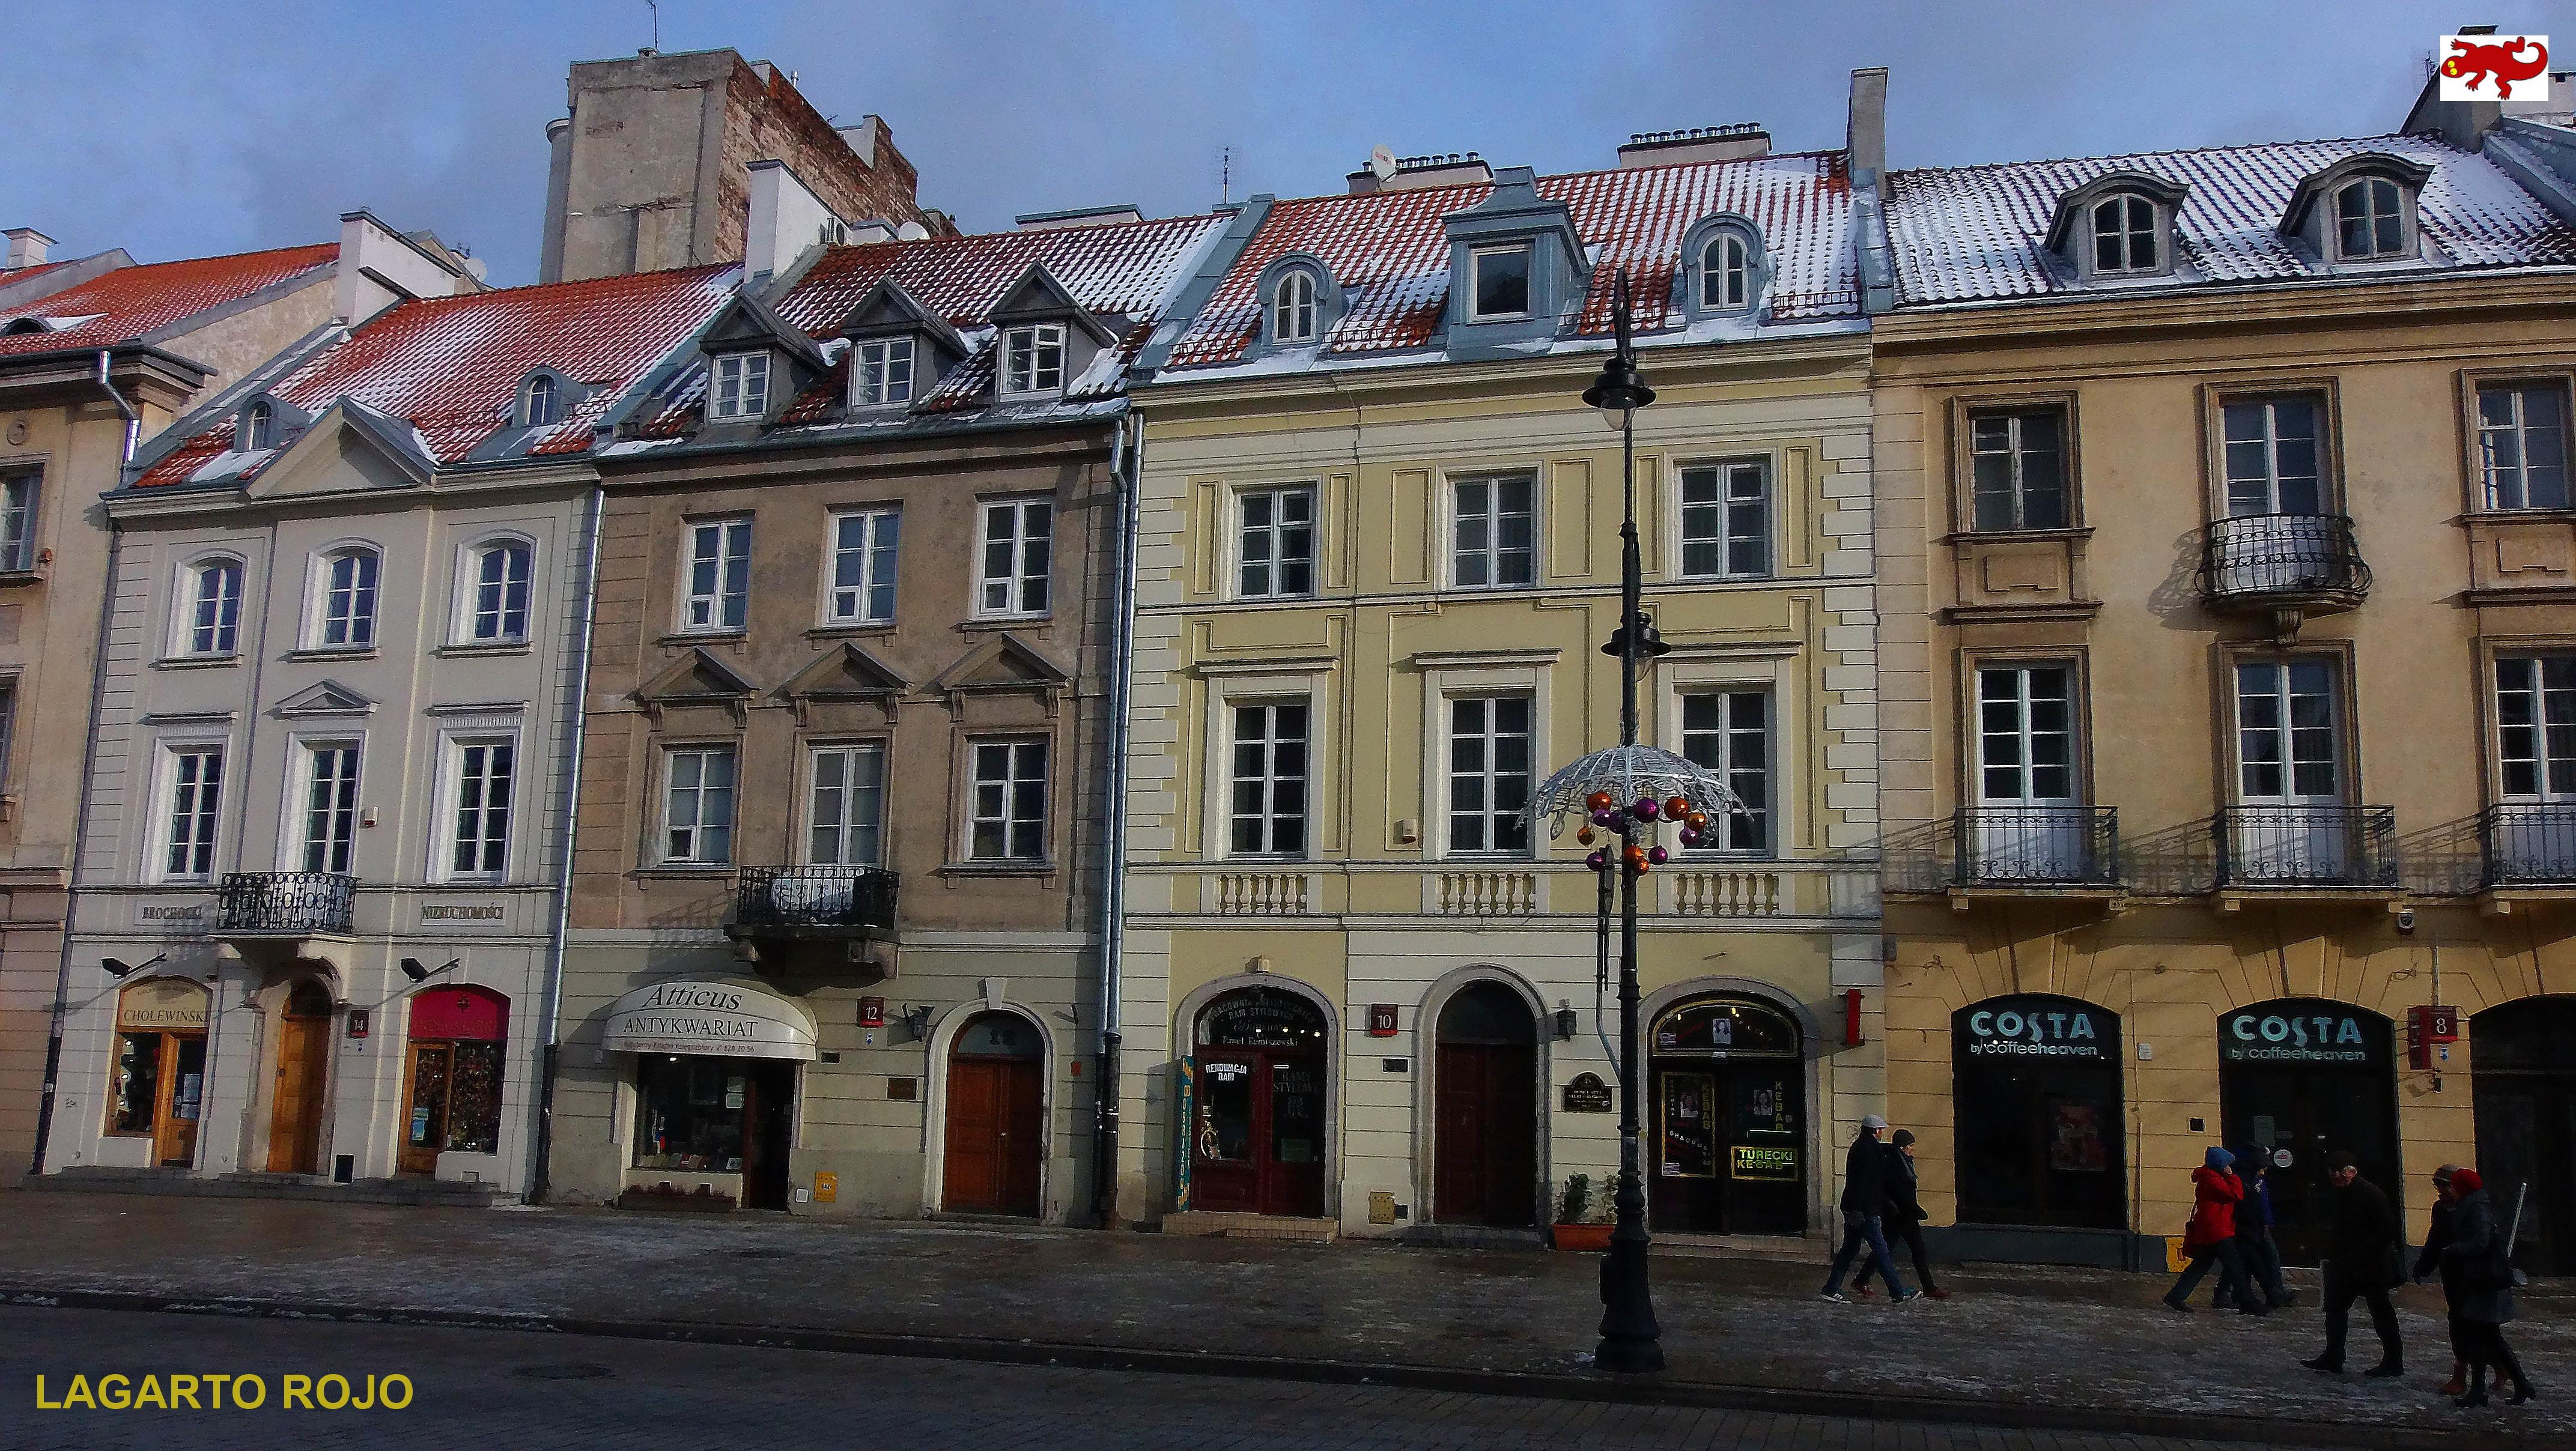 Un paseo invernal por la varsovia cl sica lagarto rojo for Oficina turismo polonia